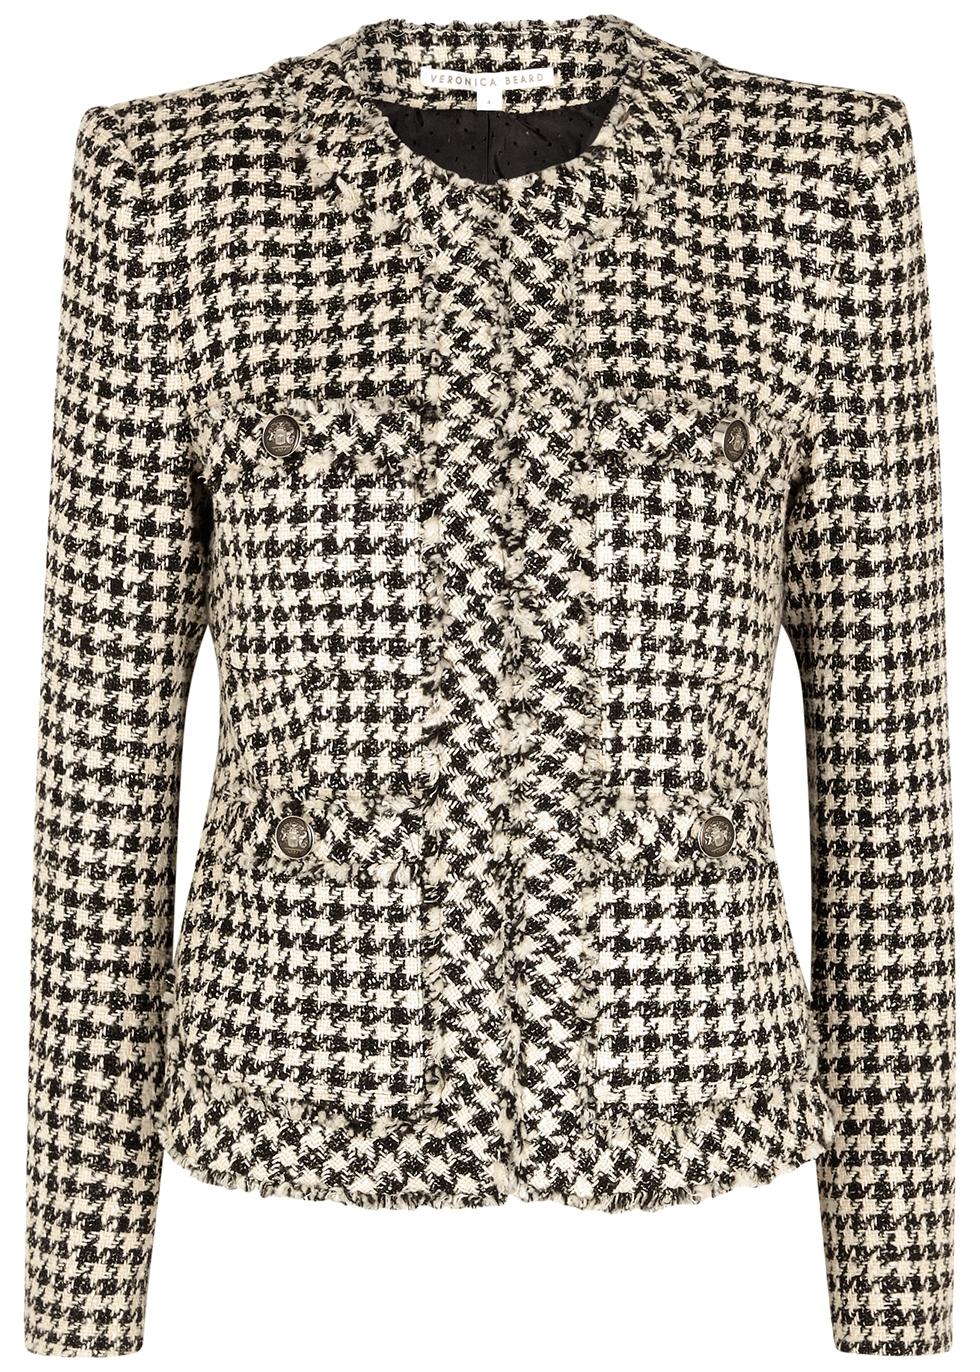 Shanti houndstooth tweed jacket